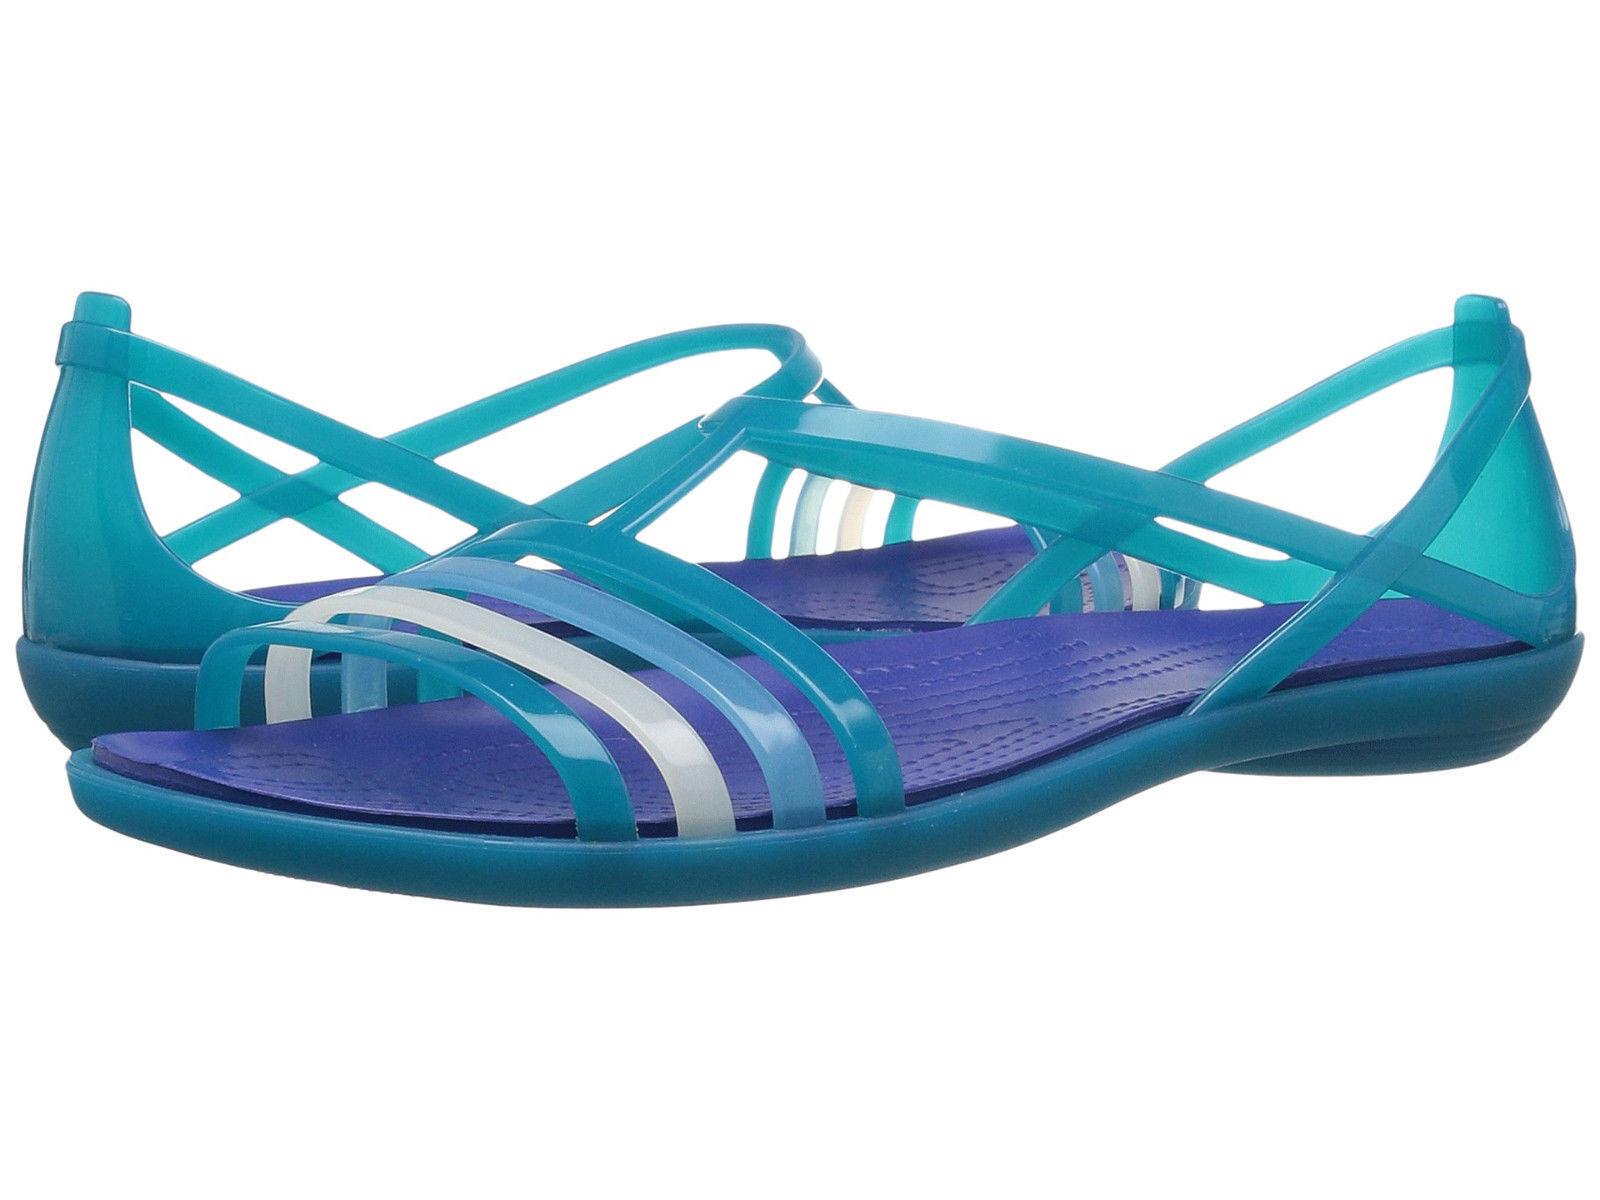 Women Crocs Isabella Flat Sandal 202465-4PI Turquoise bluee 100% Original B. New